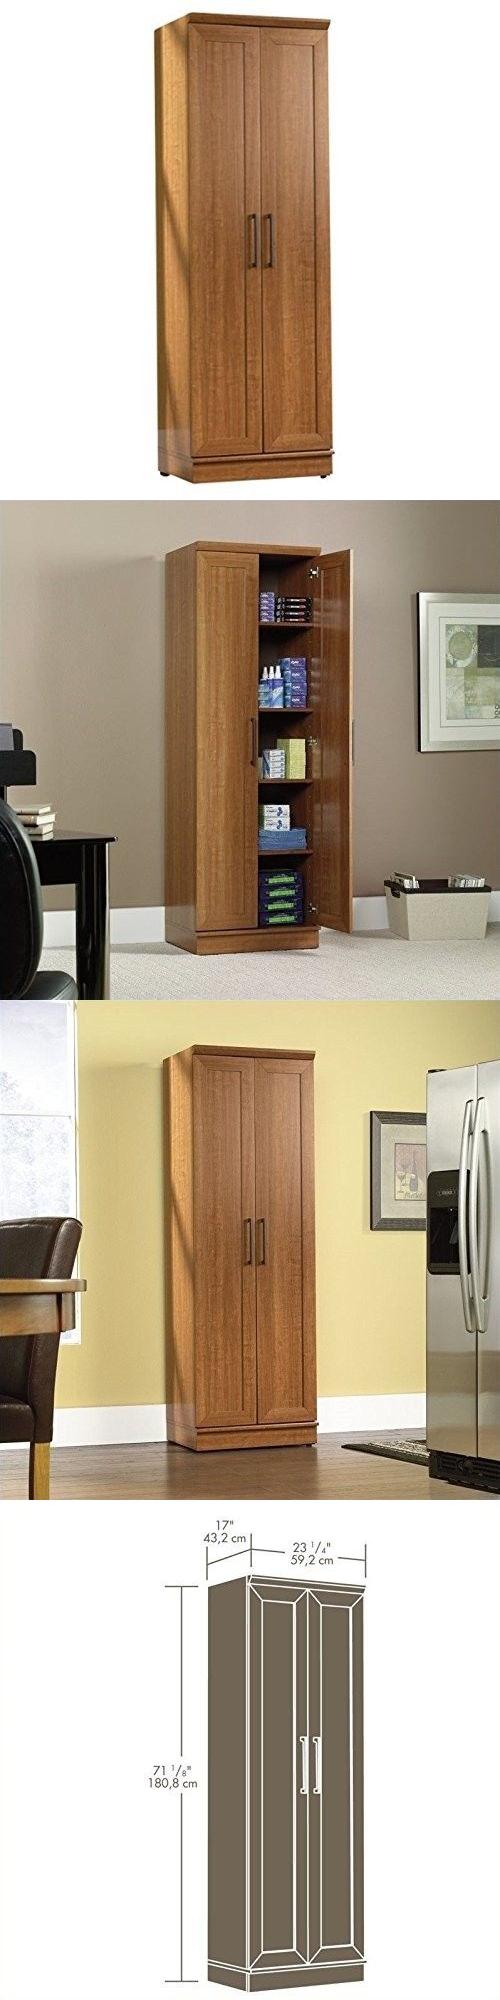 Basic kitchen cabinets  Cabinets and Cupboards  Laundry Kitchen Pantry Wardrobe Basic